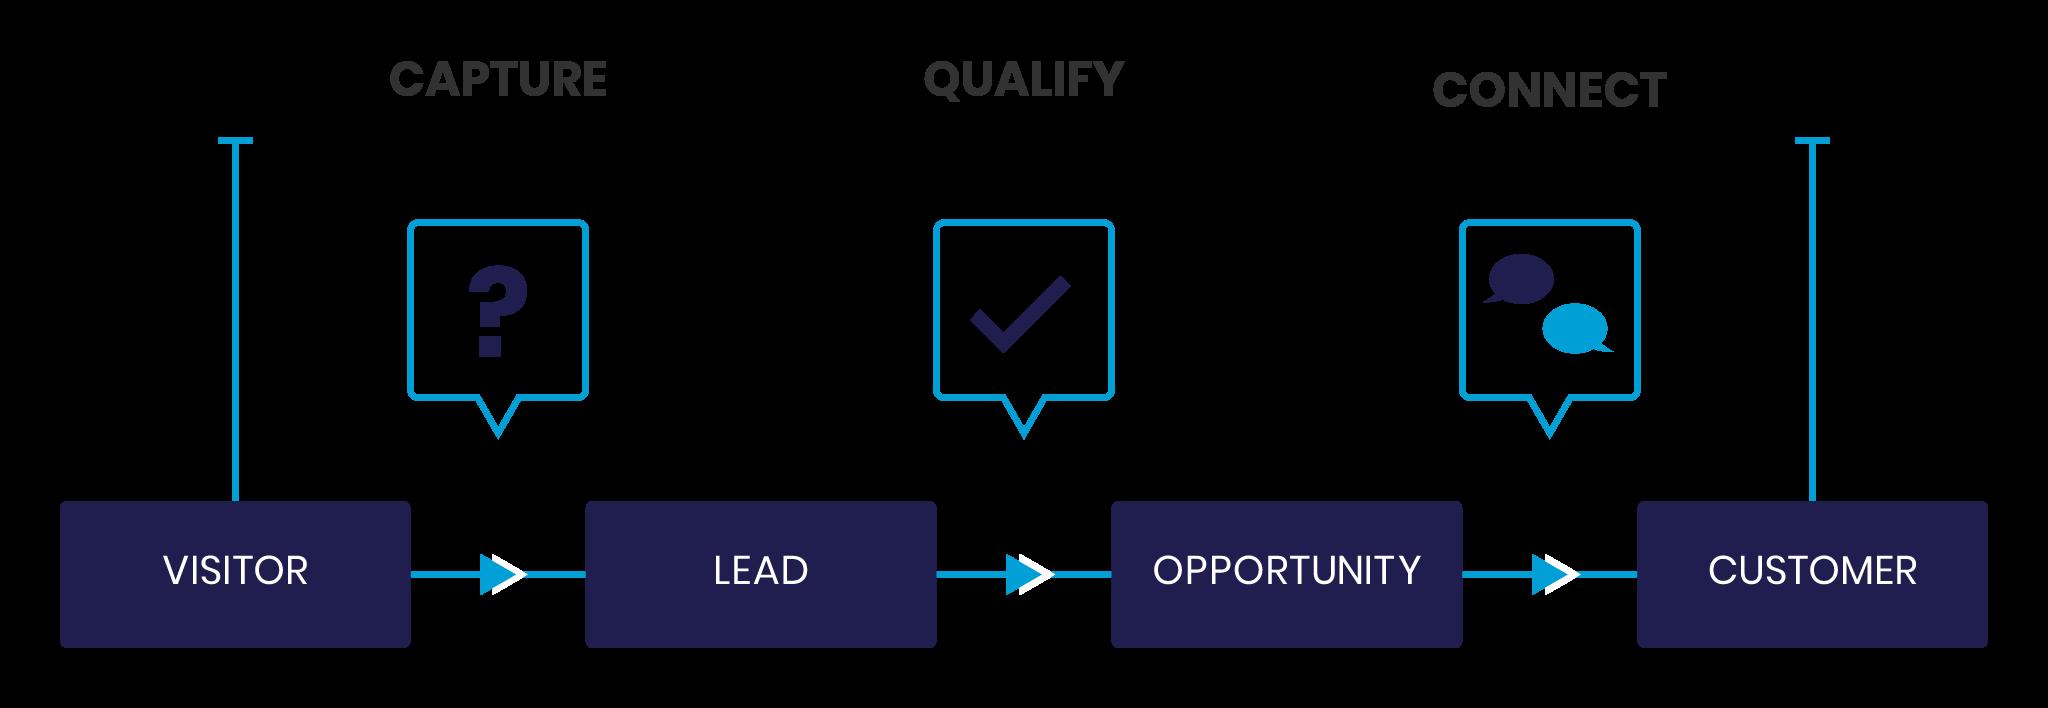 conversational-marketing-outline-Dirft